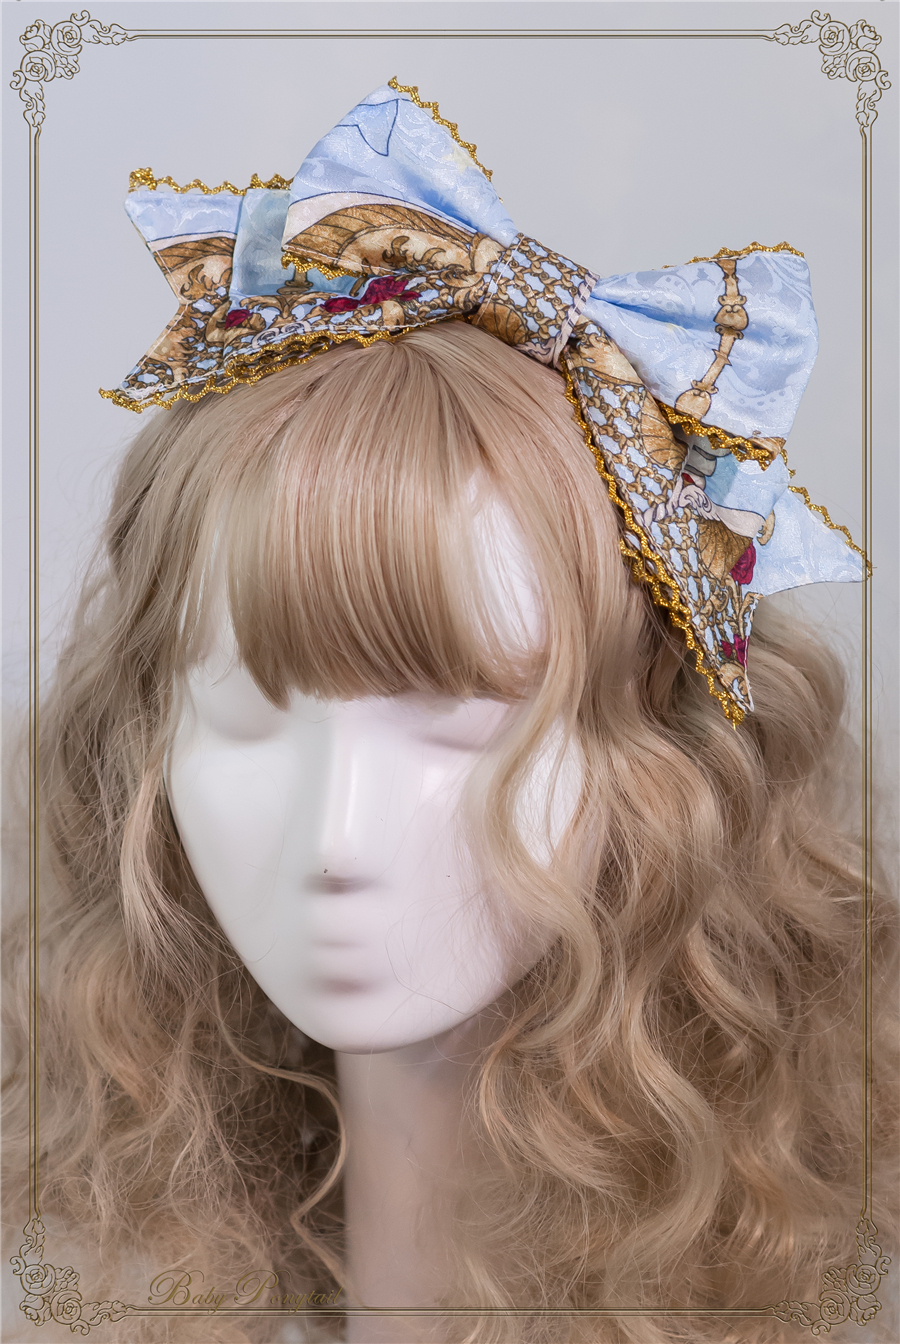 Baby Ponytail_Stock photo_Circus Princess_KC Sax_02.jpg